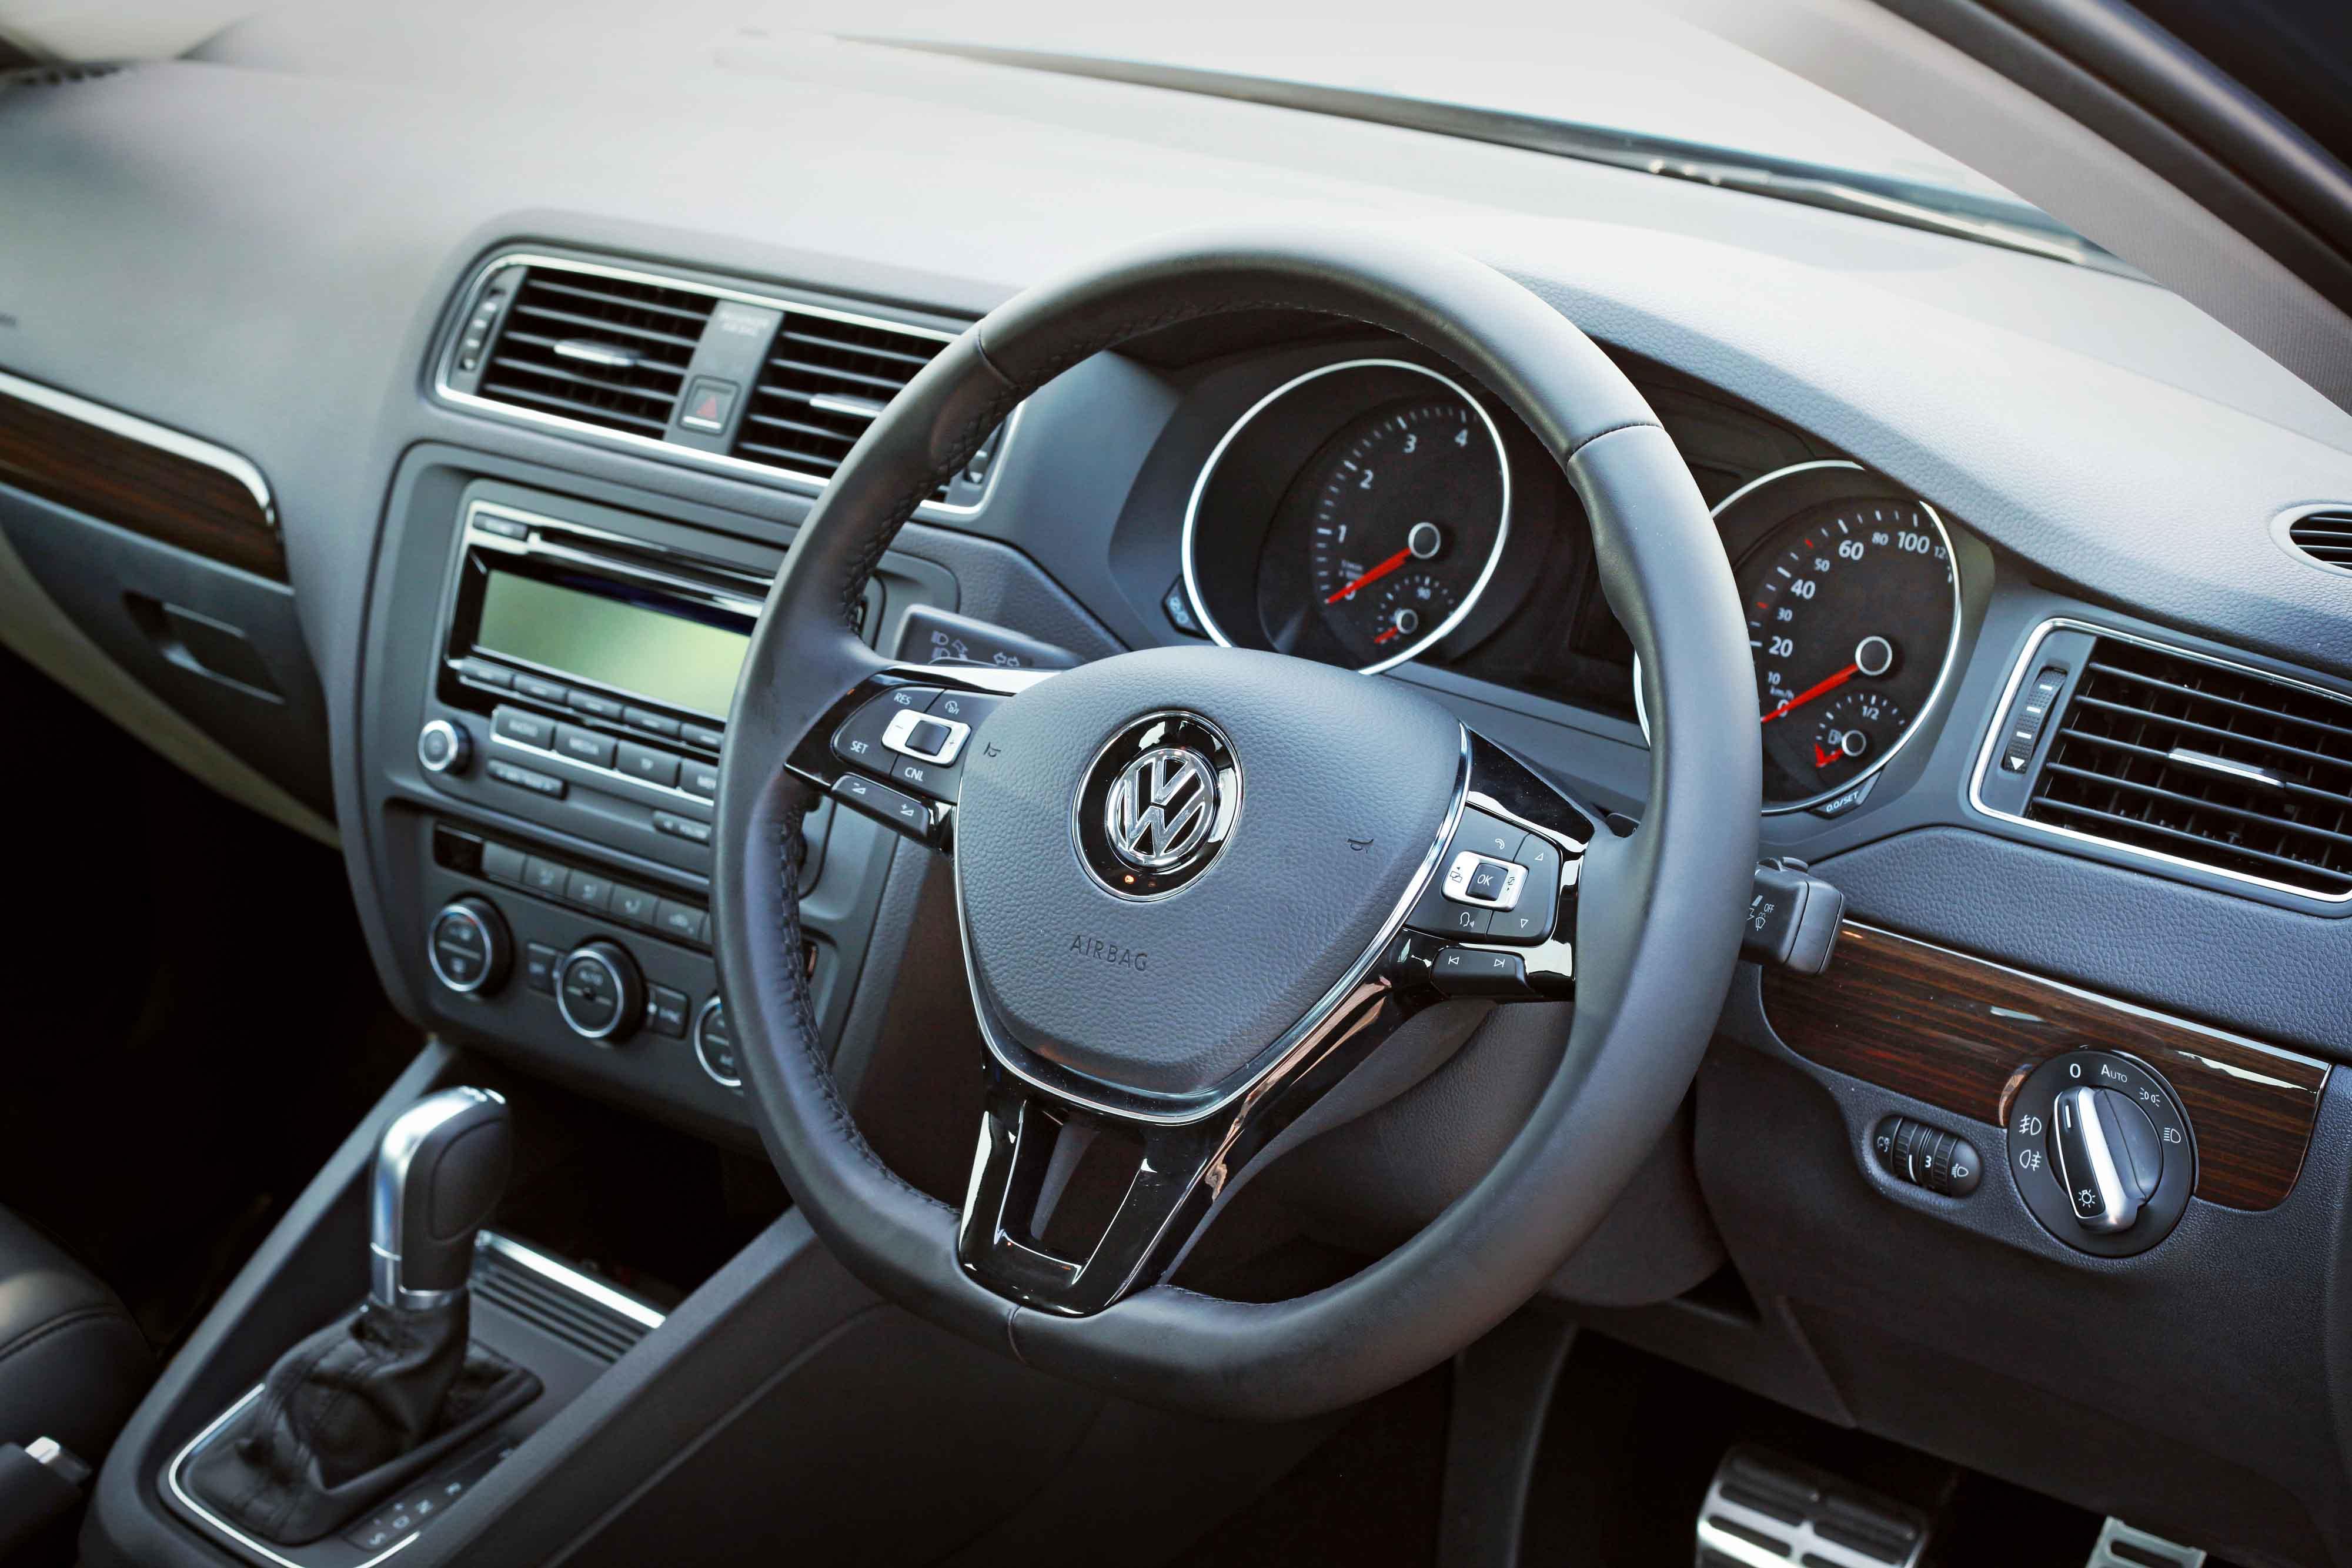 manual sedan fake photo volkswagen door thumbnails from buck jetta s cars mdp shot interior